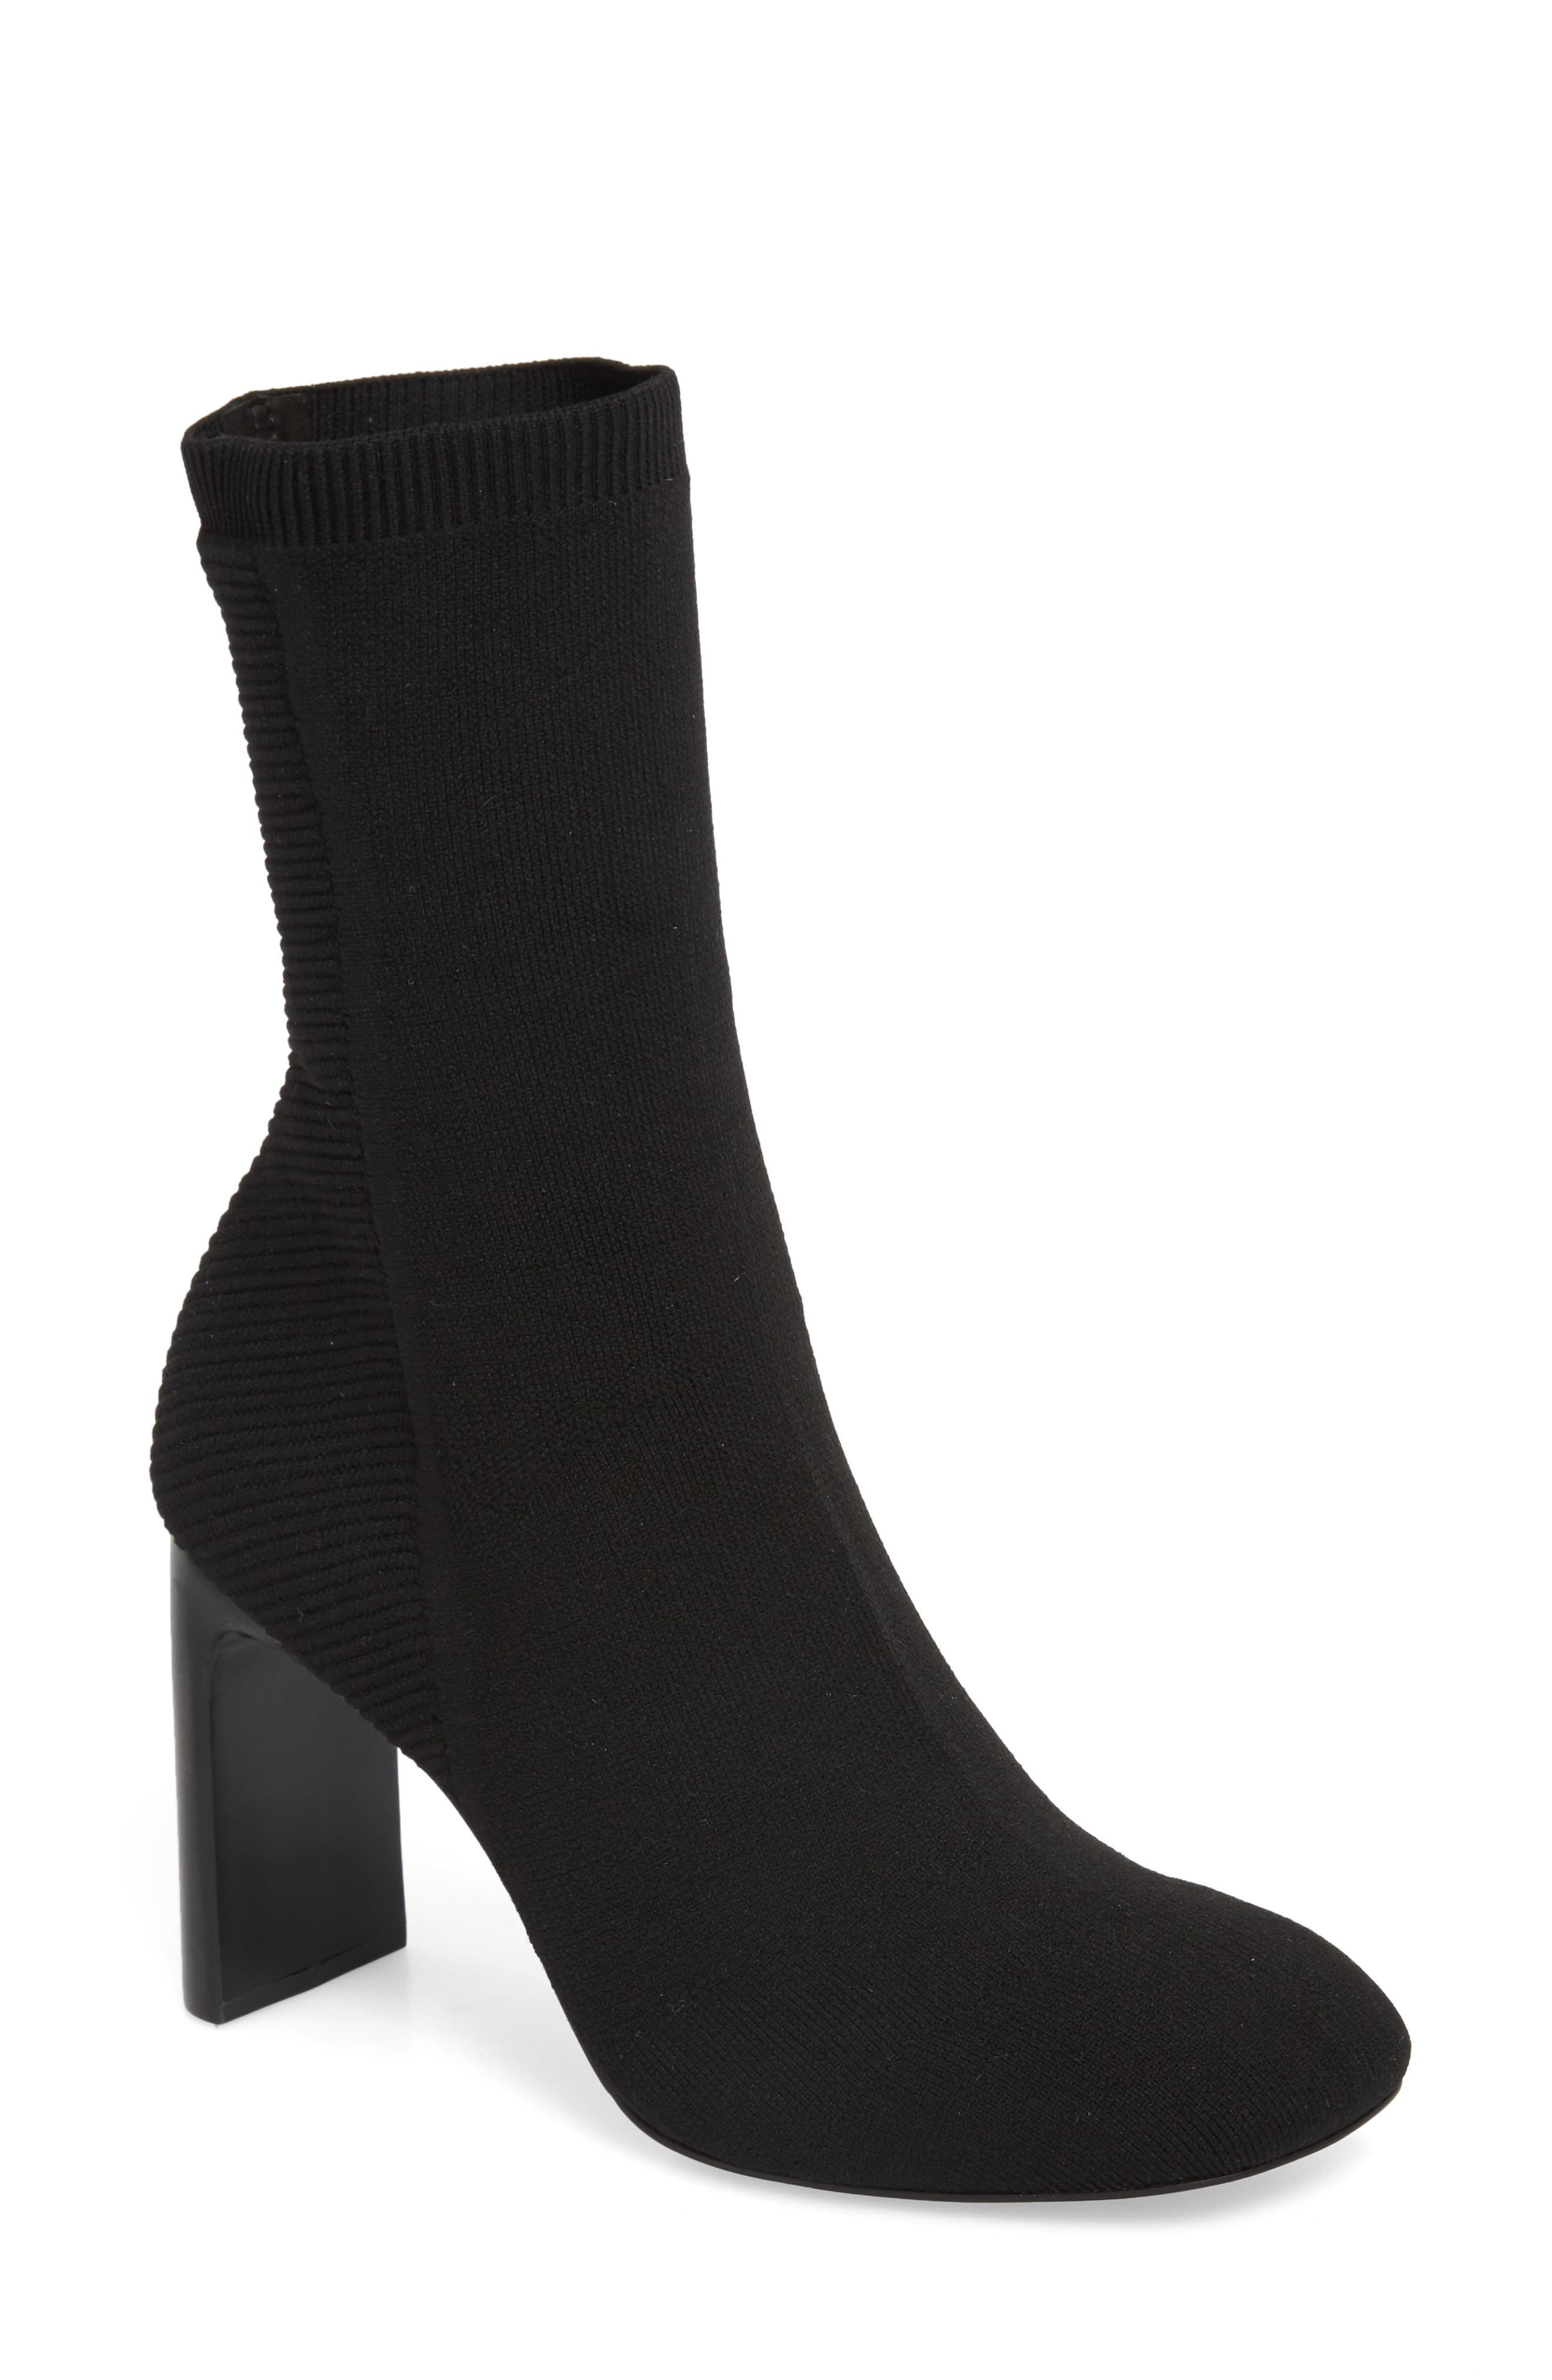 Rag & Bone Ellis Sock Knit Boot, Black